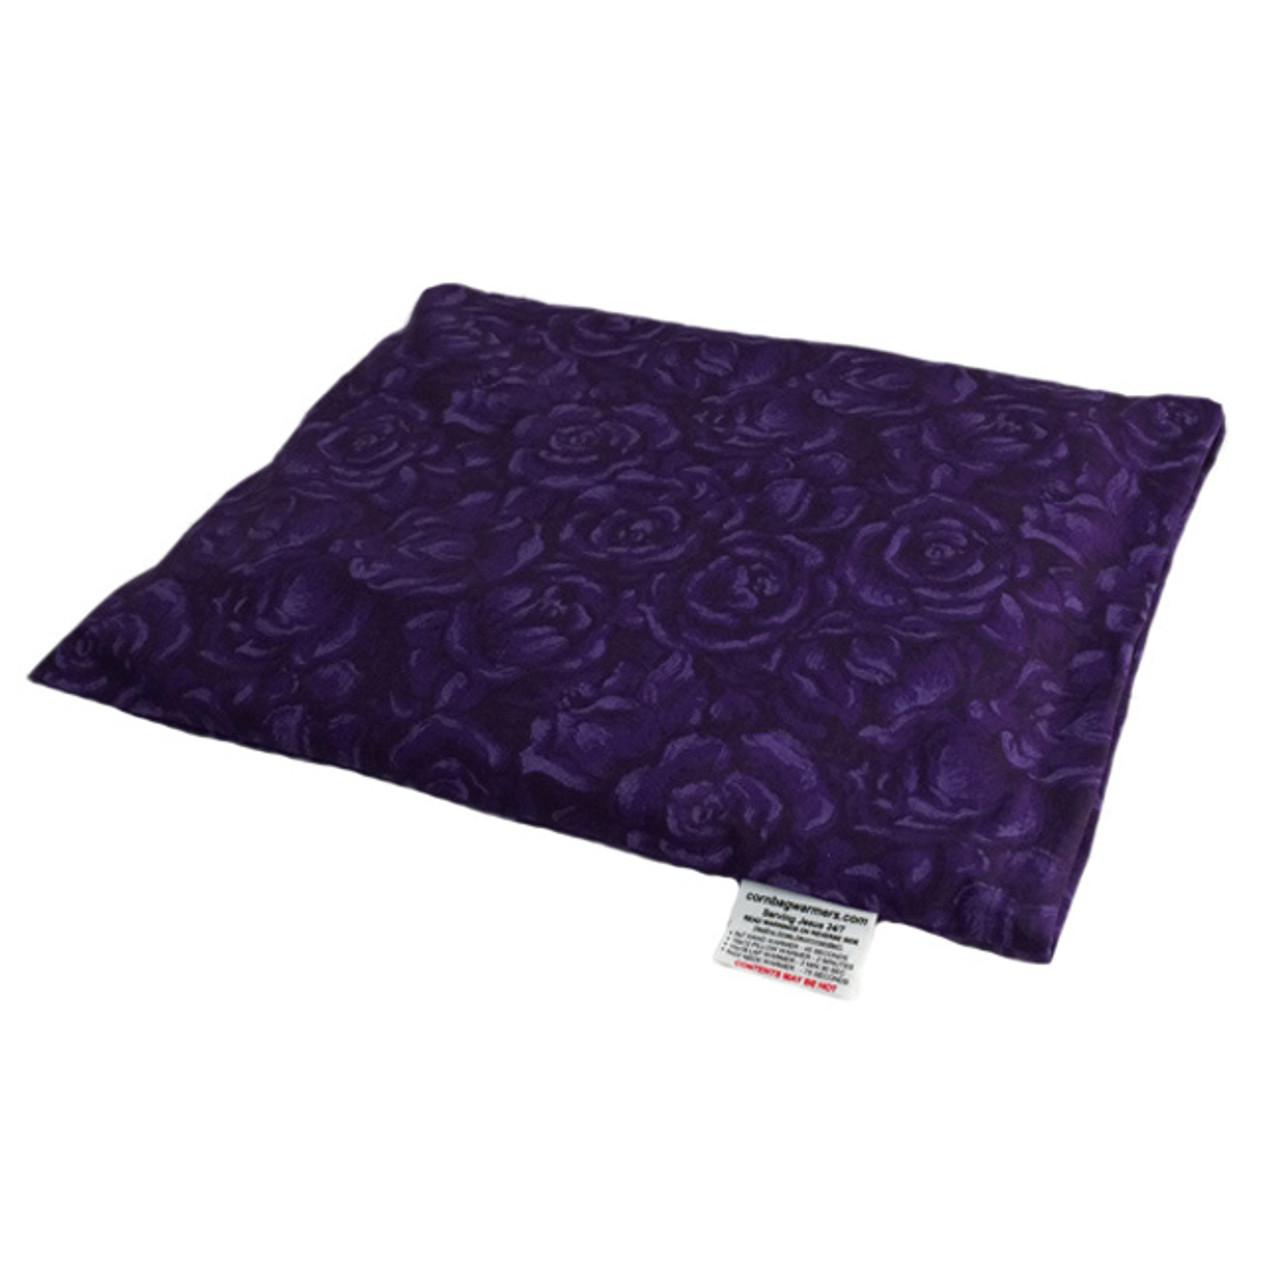 Deep Purple Roses Pillow Warmer Microwave Heating Pad